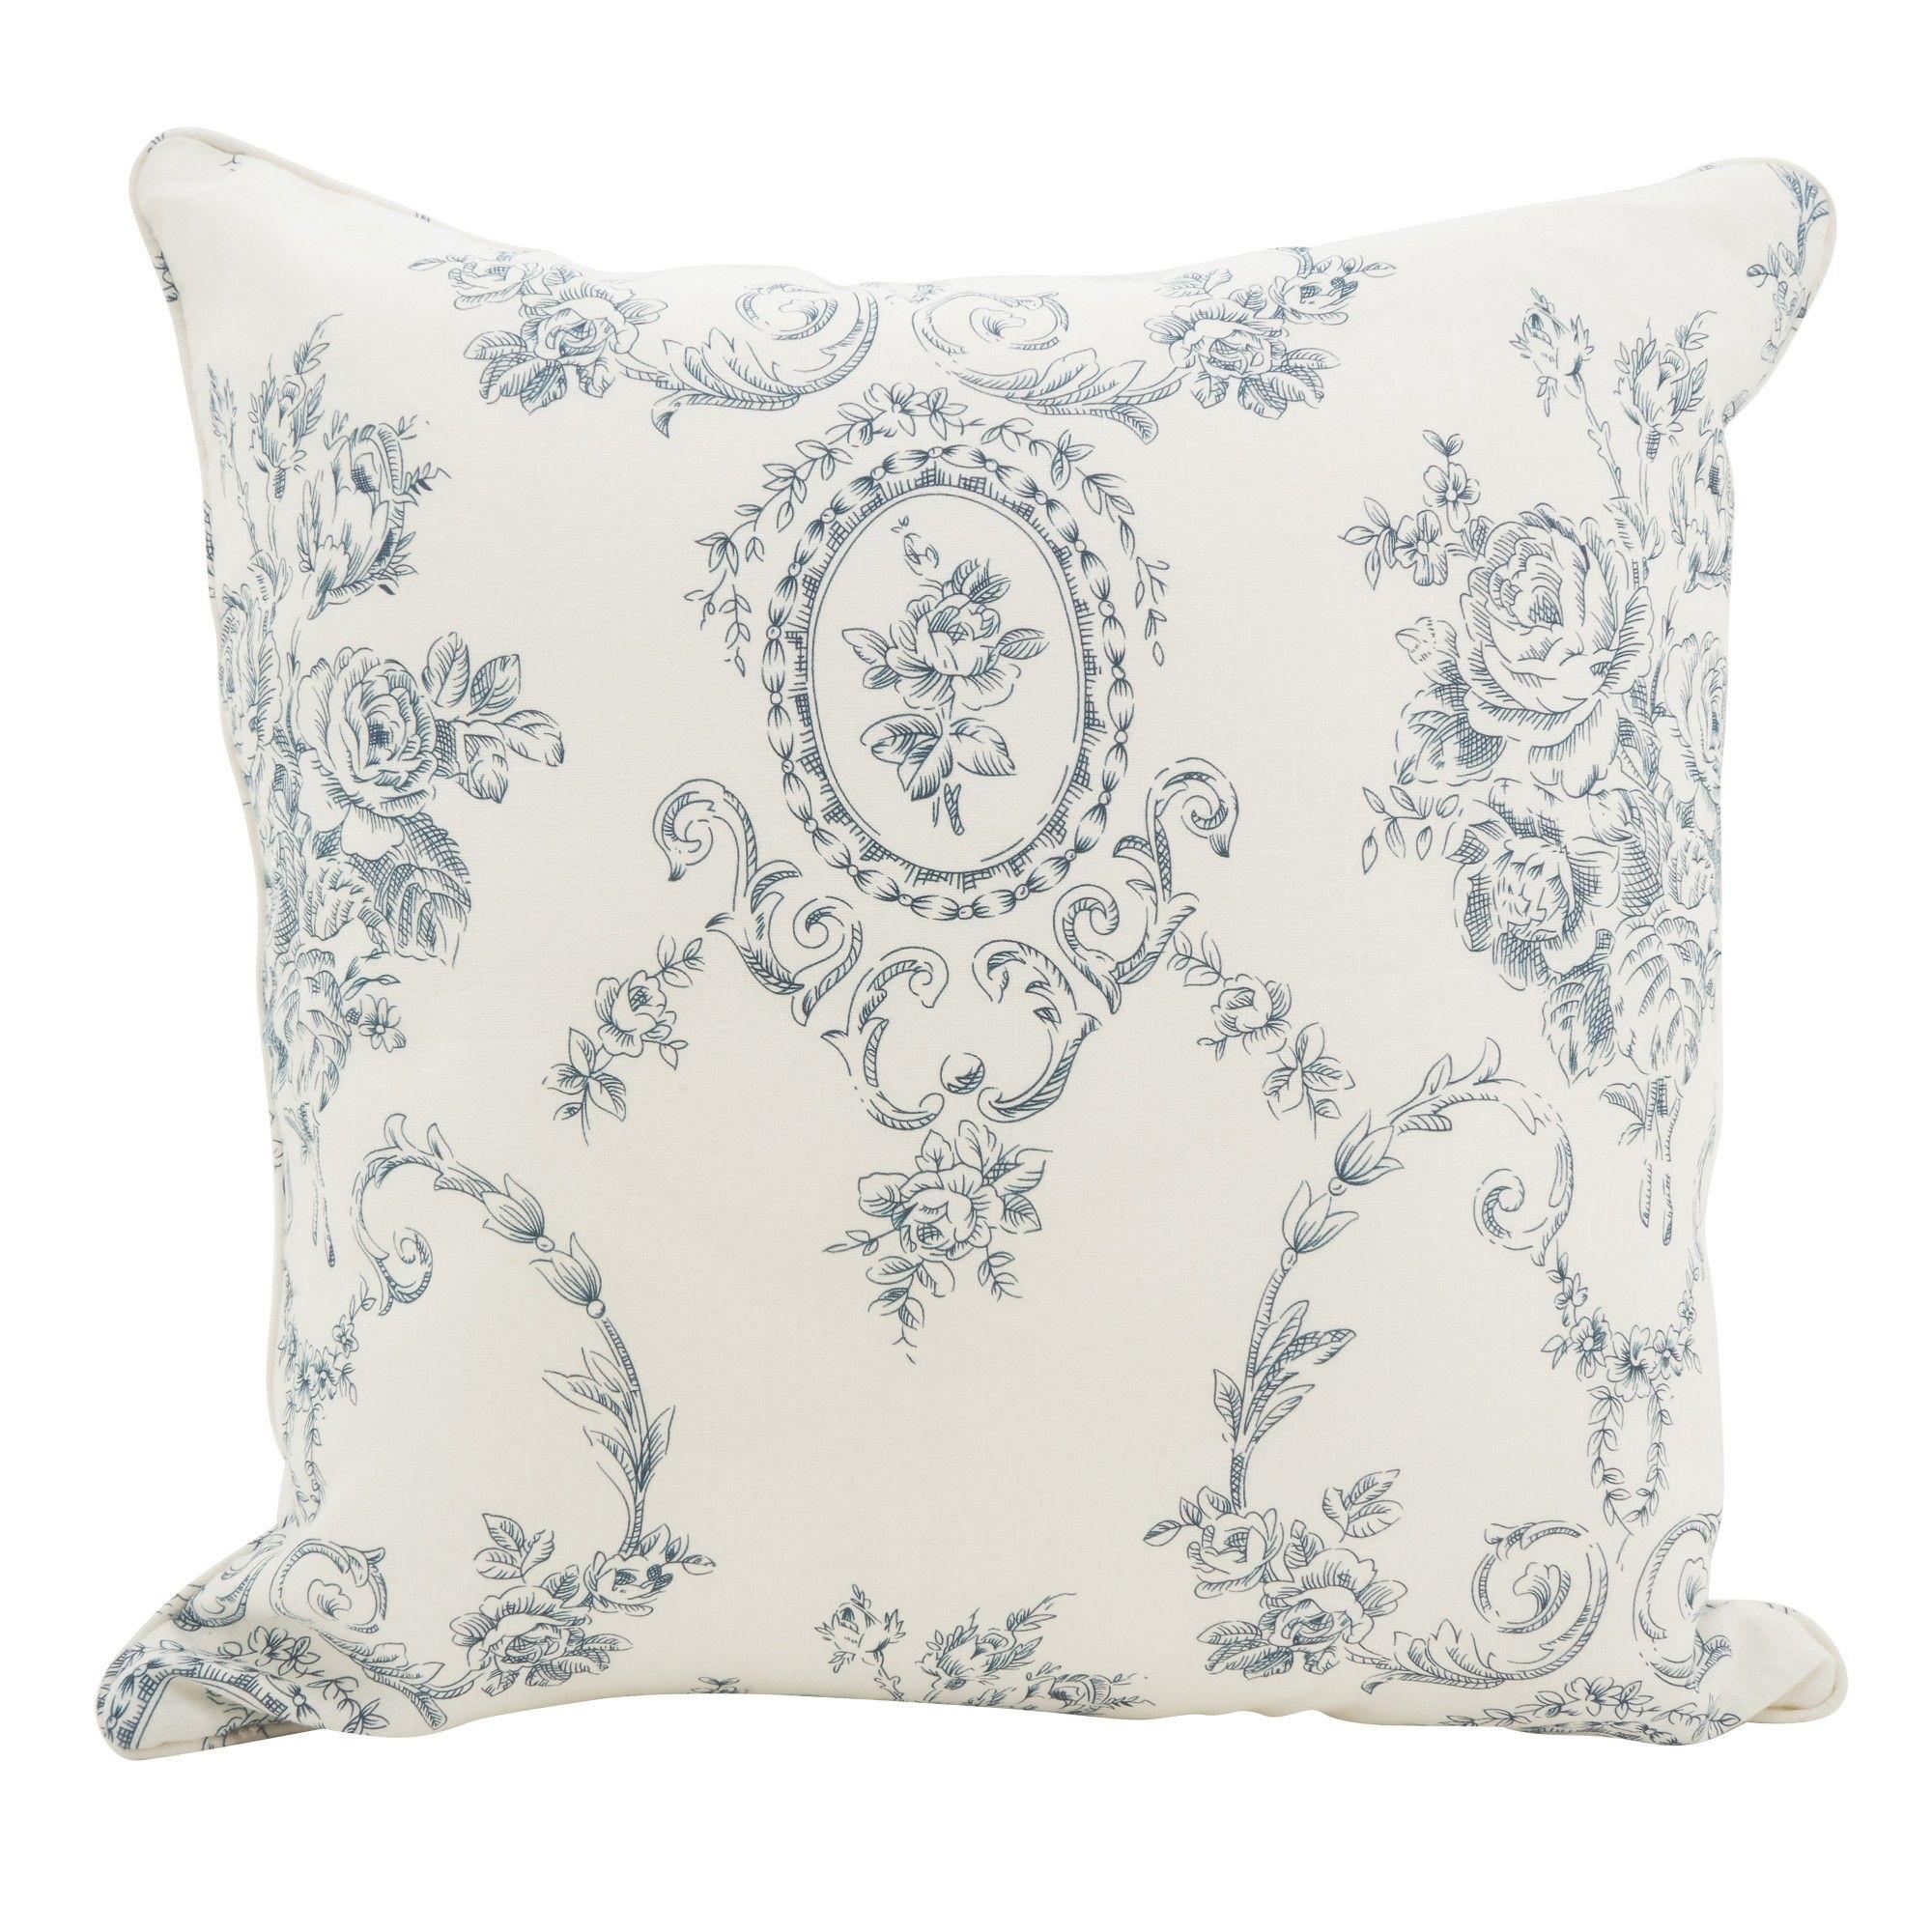 Saro Lifestyle 20X20 Floral Fancy Linen Down Filled Throw Pillow